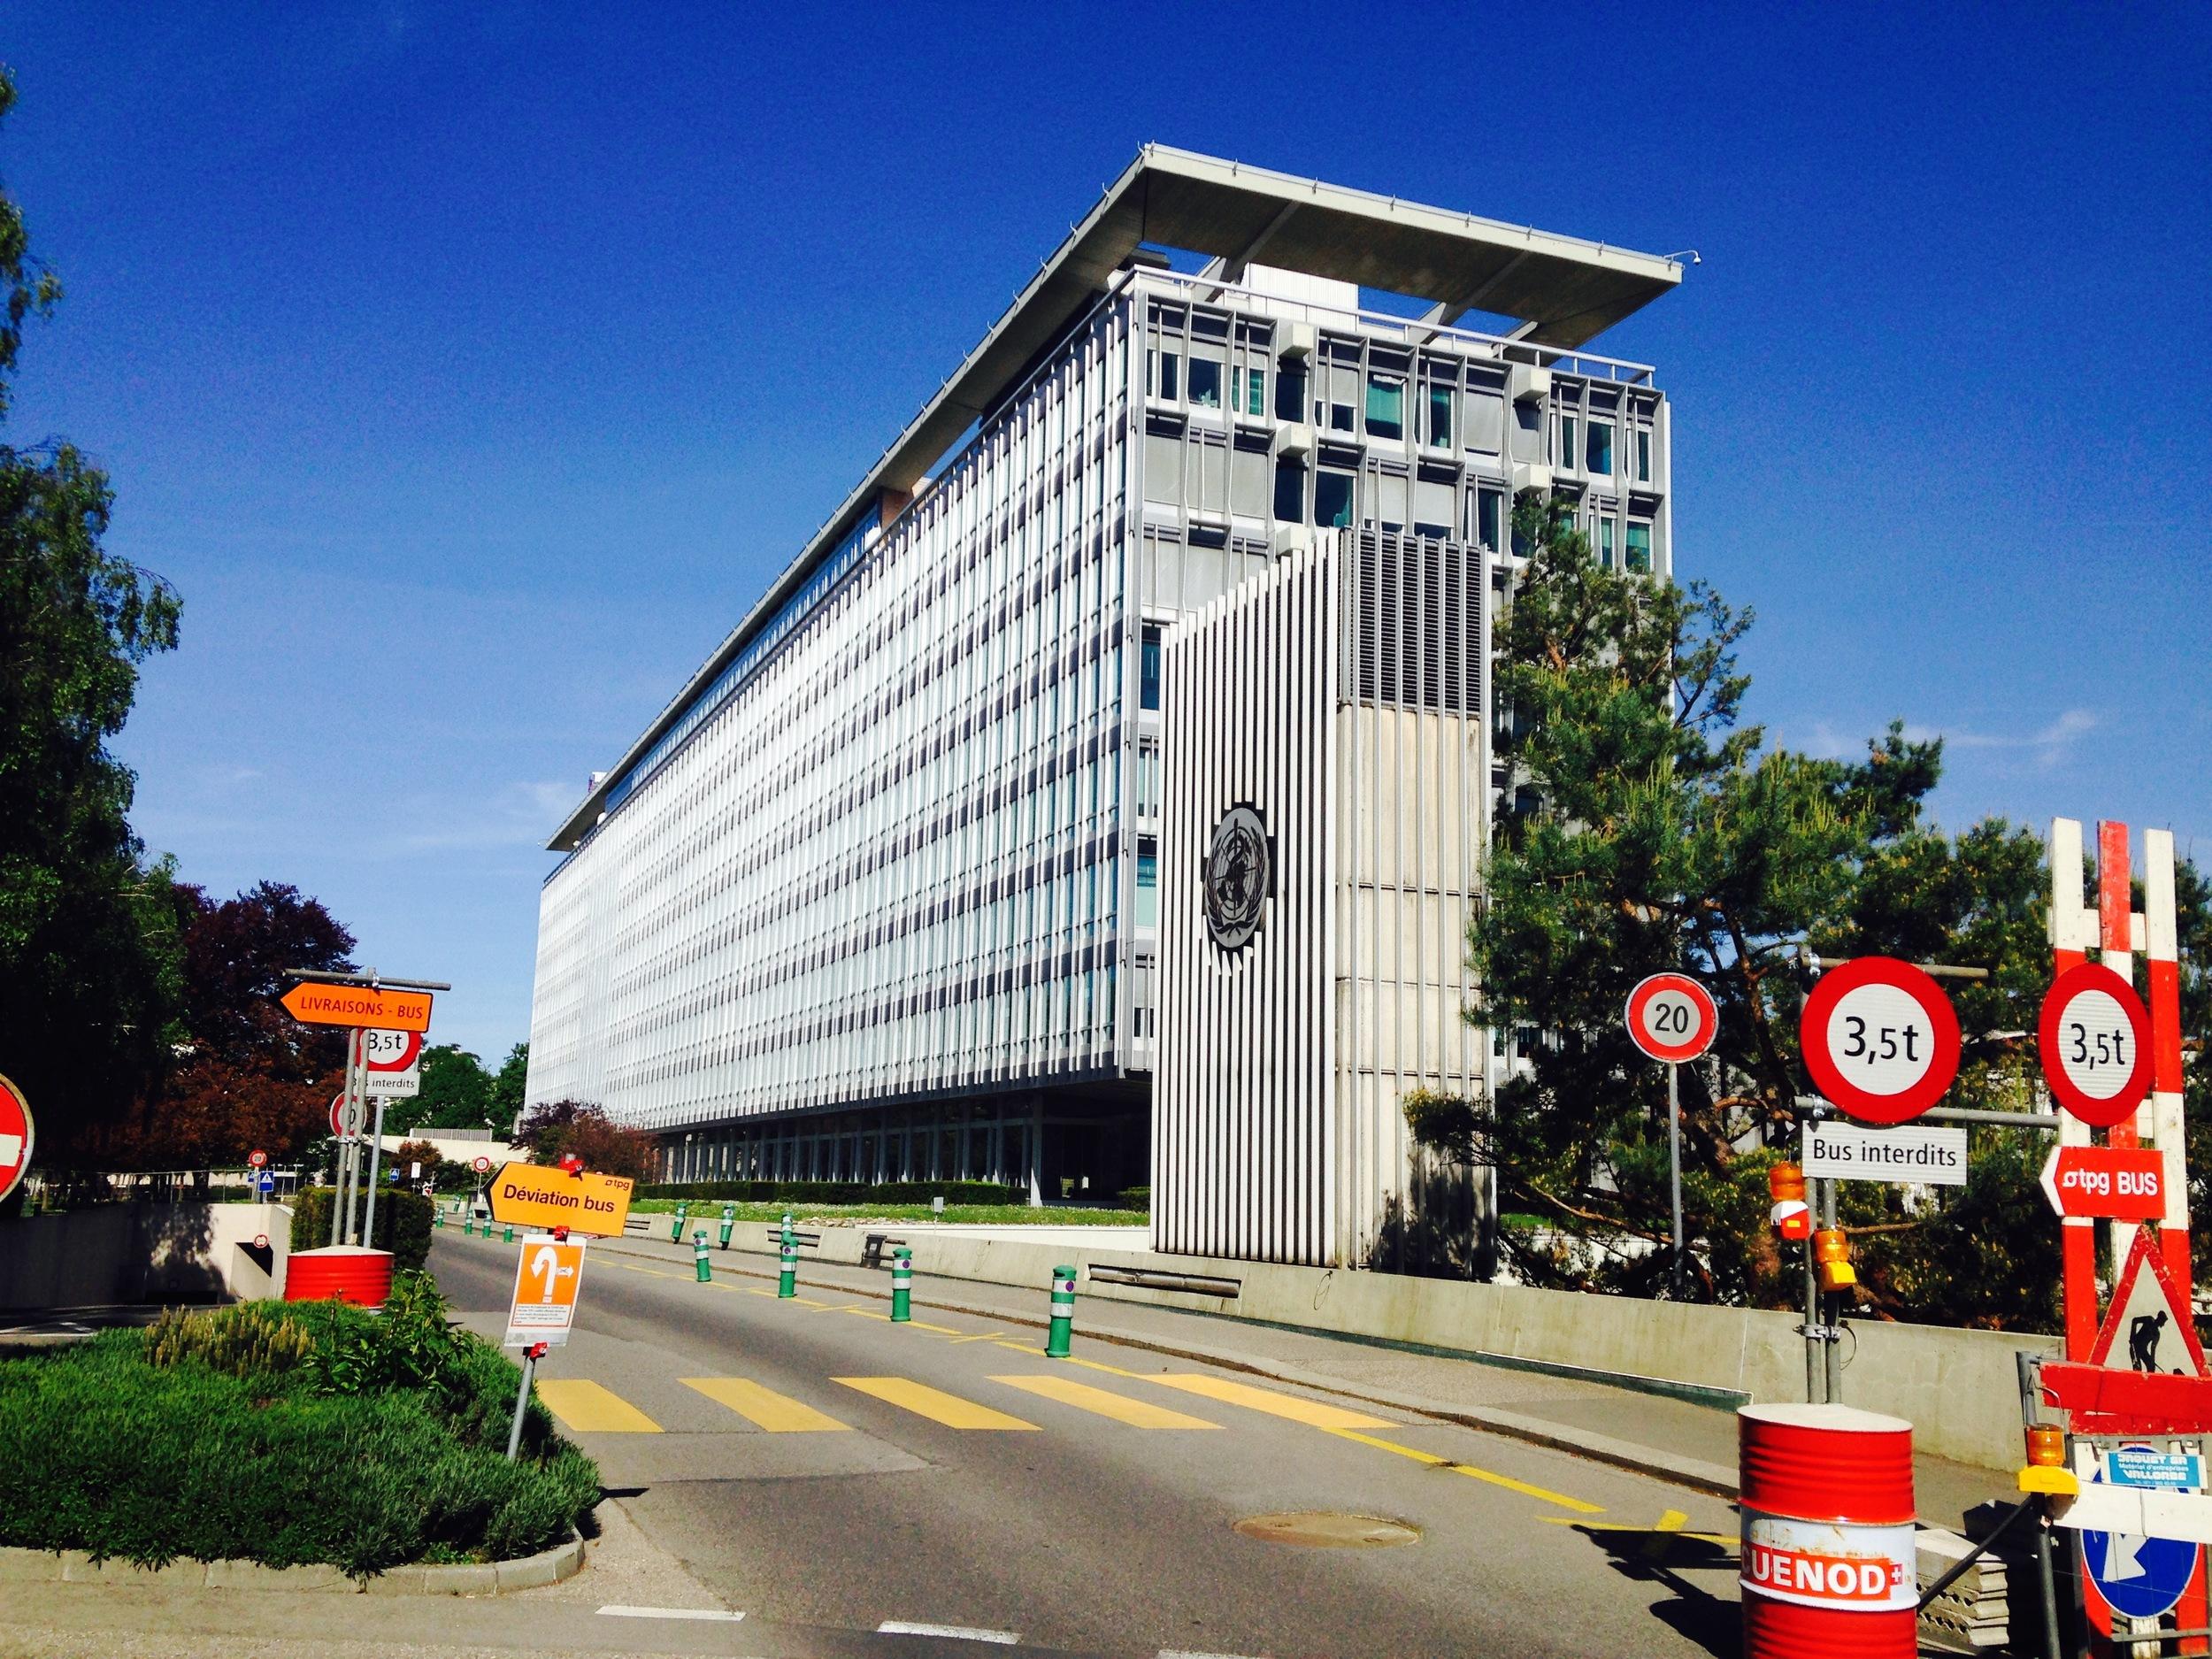 The World Health Organization Headquarters in Geneva, Switzerland